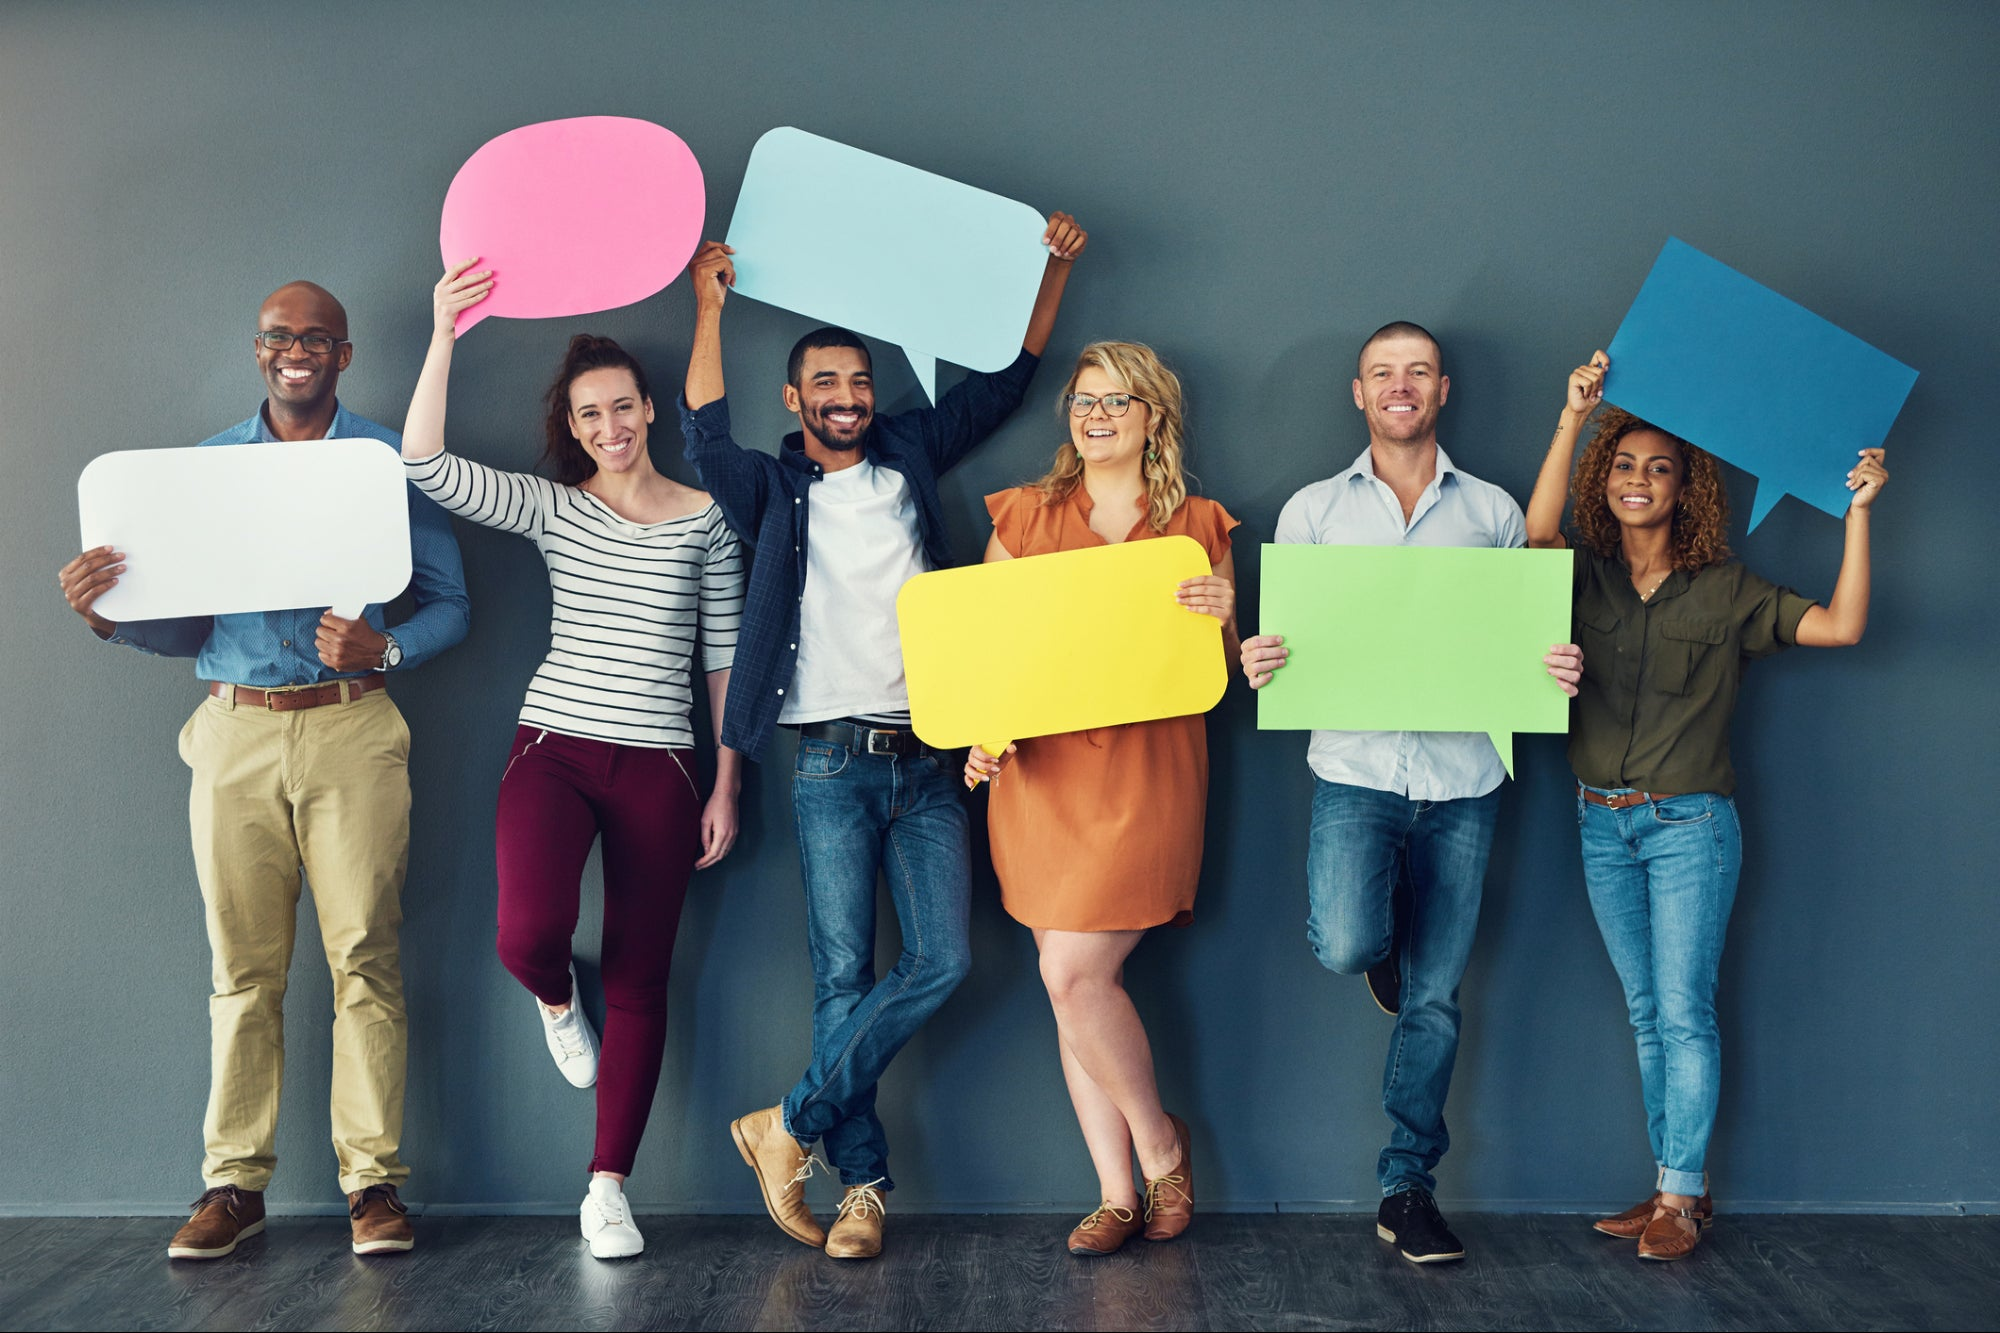 , 5 Branding Tips Every Entrepreneur Needs to Focus On, Saubio Making Wealth